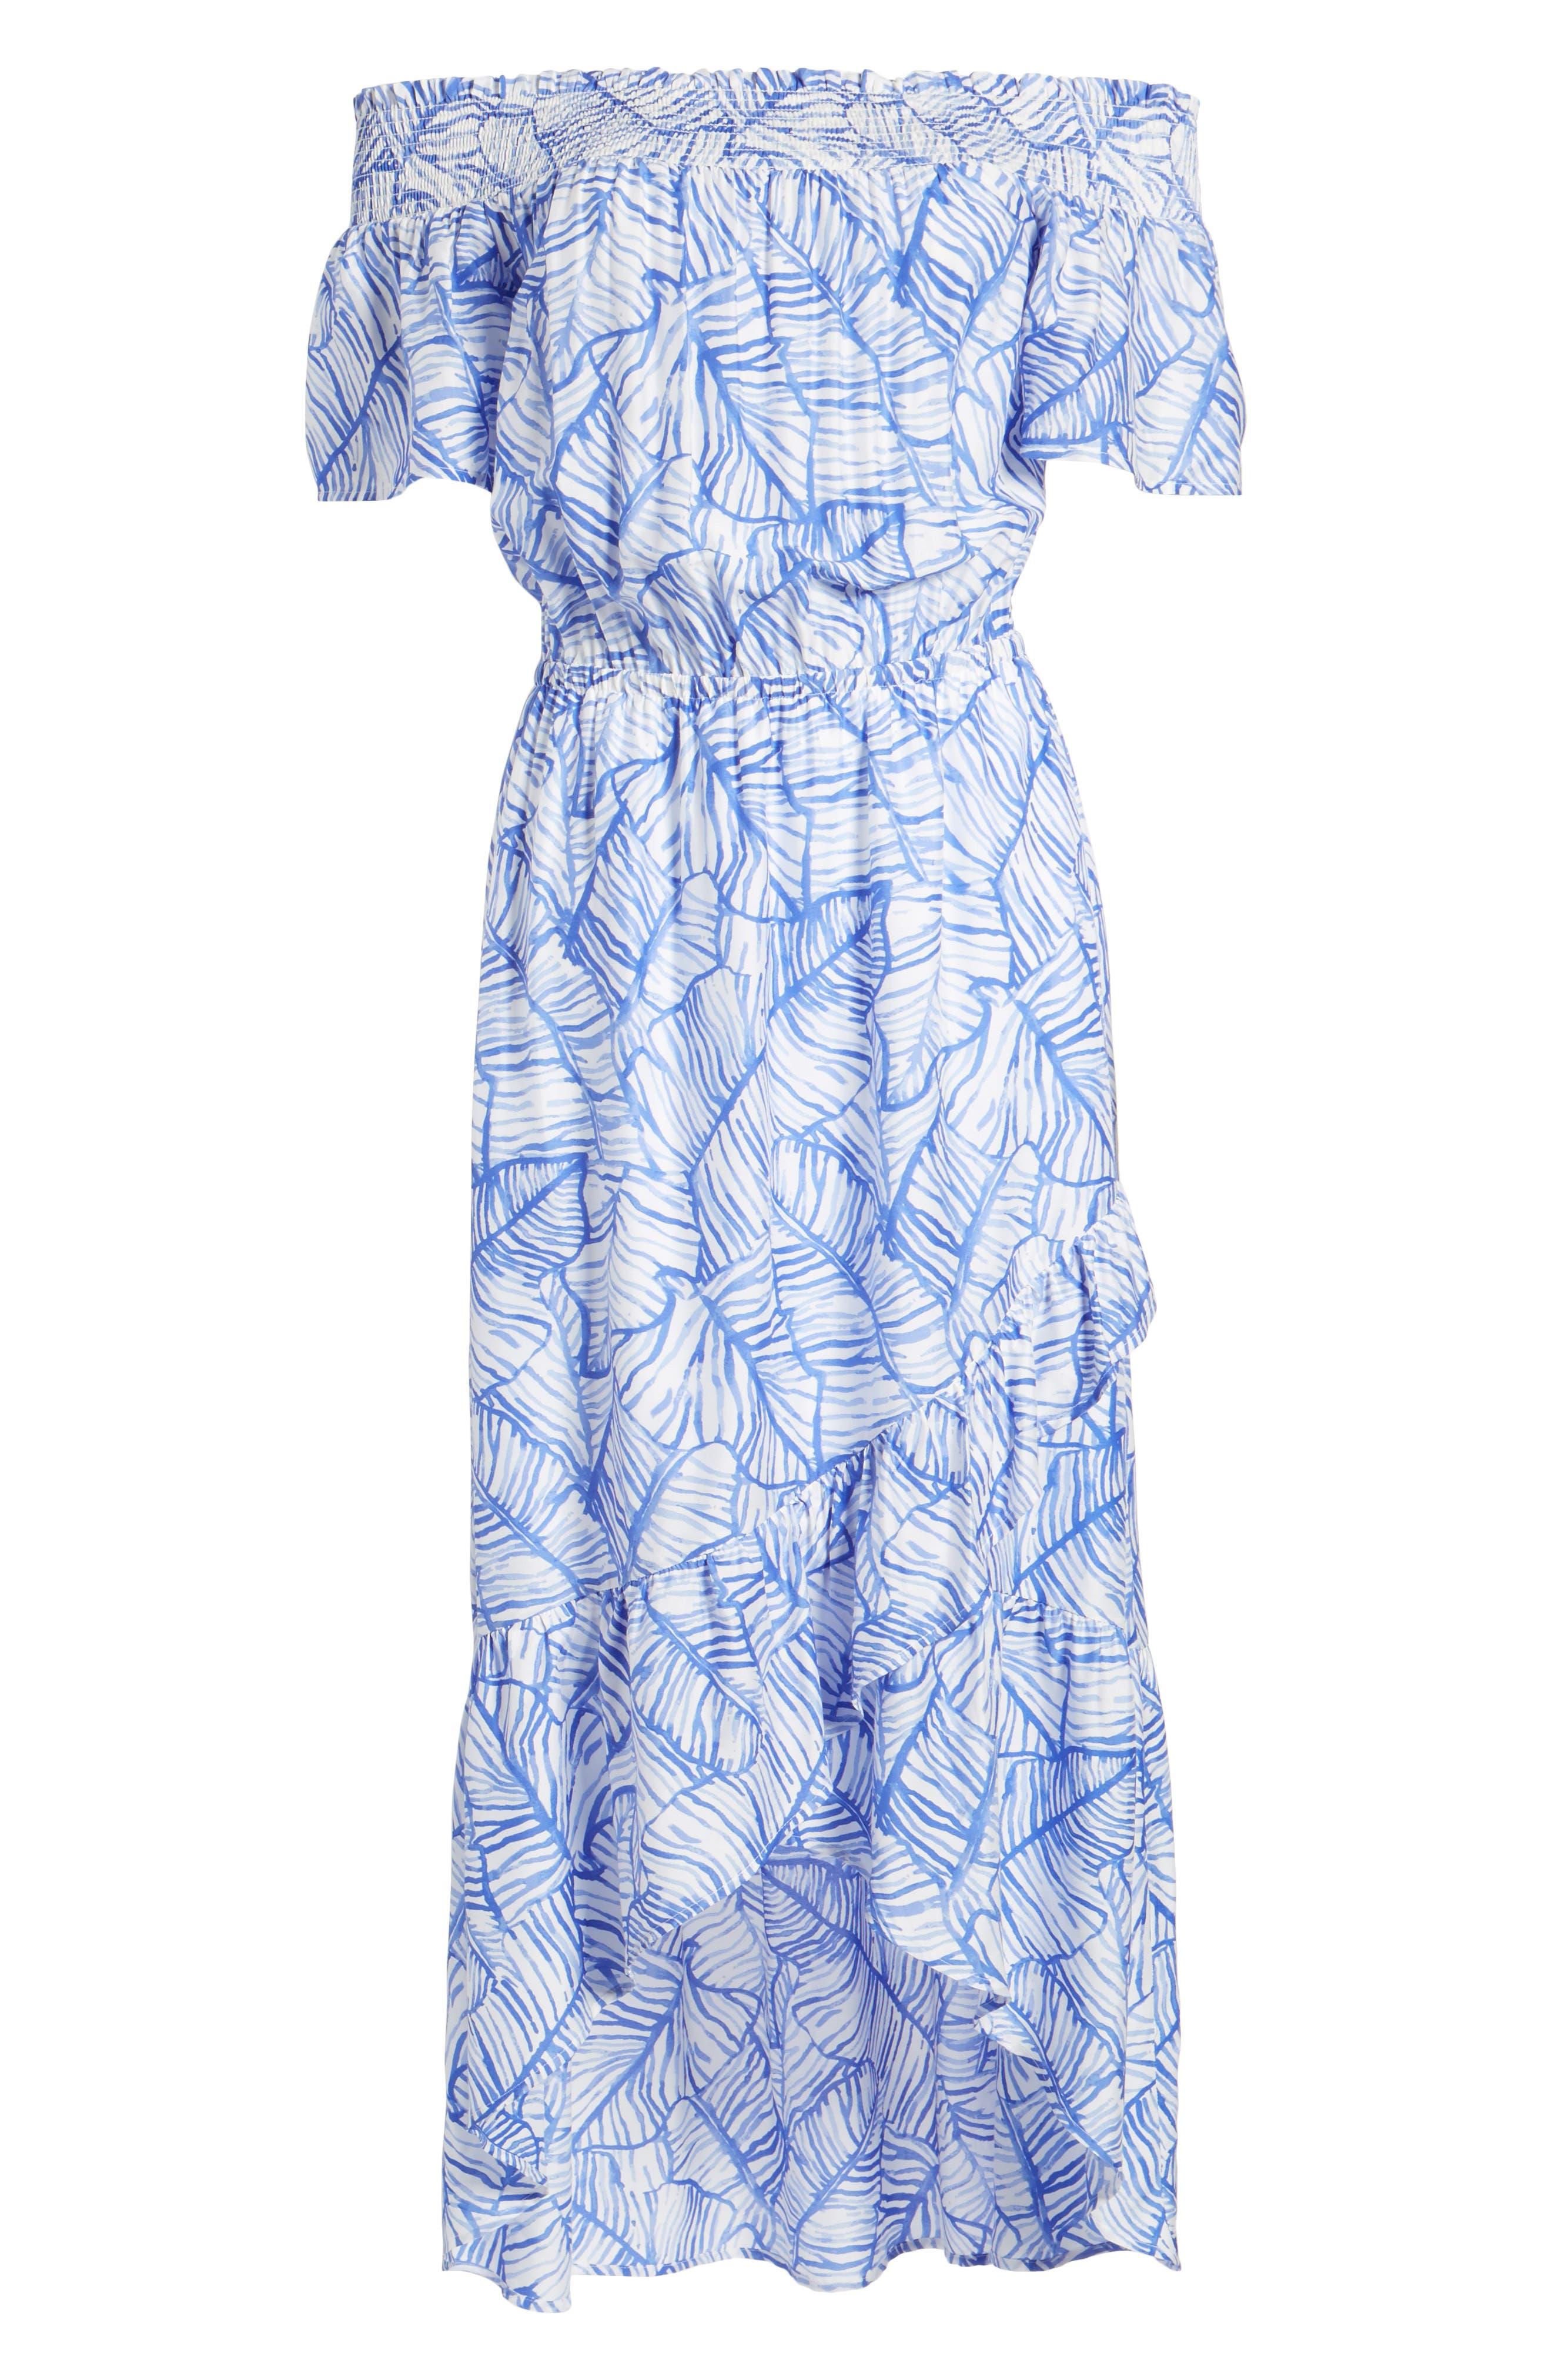 Banana Leaf High/Low Maxi Dress,                             Alternate thumbnail 6, color,